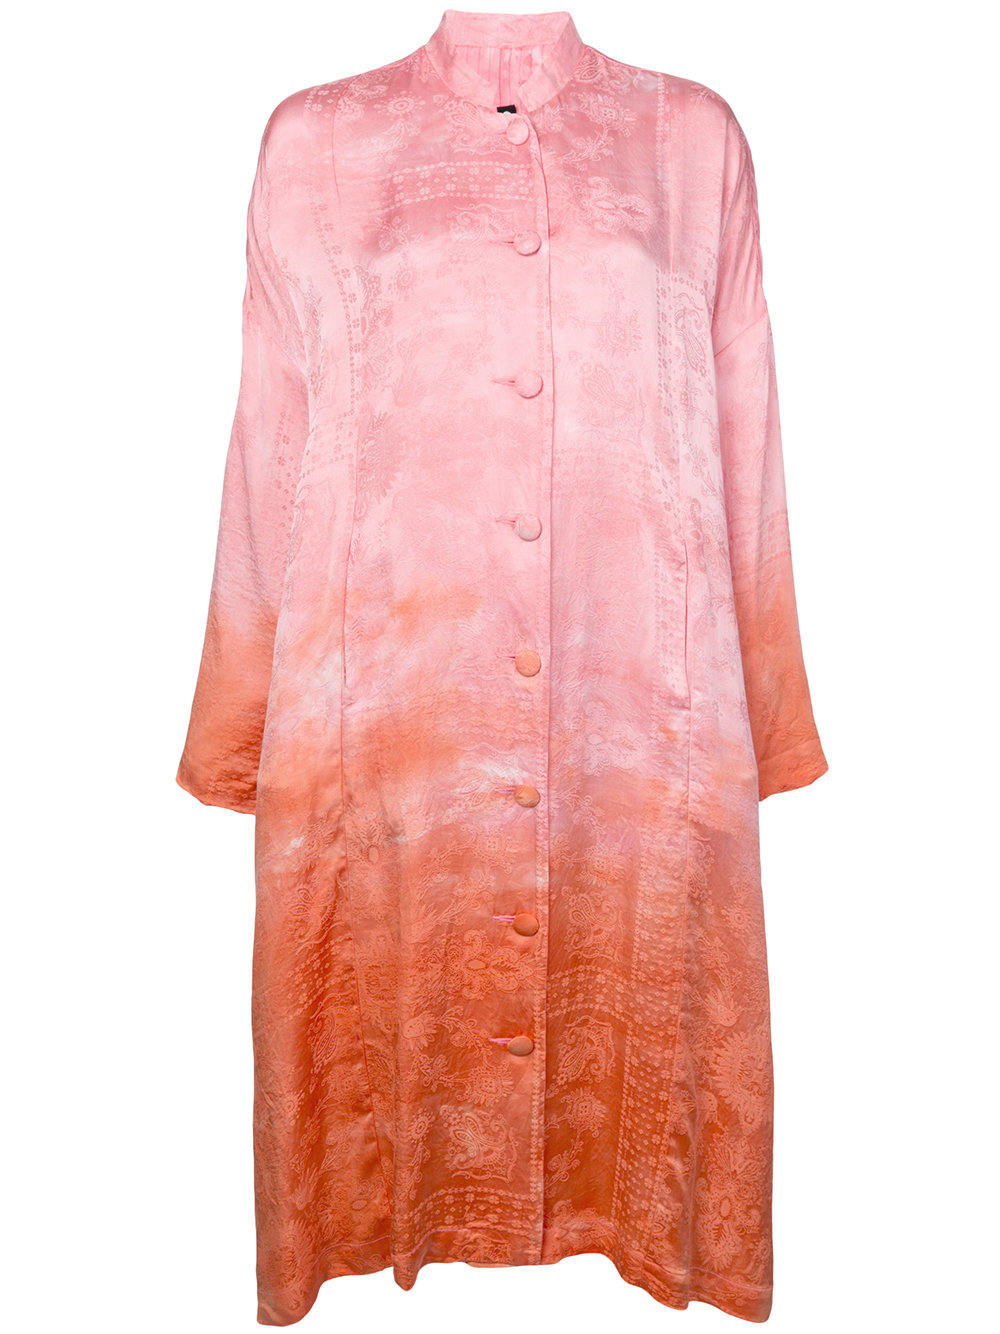 Raquel Allegra   Two Tone Kimono Dress